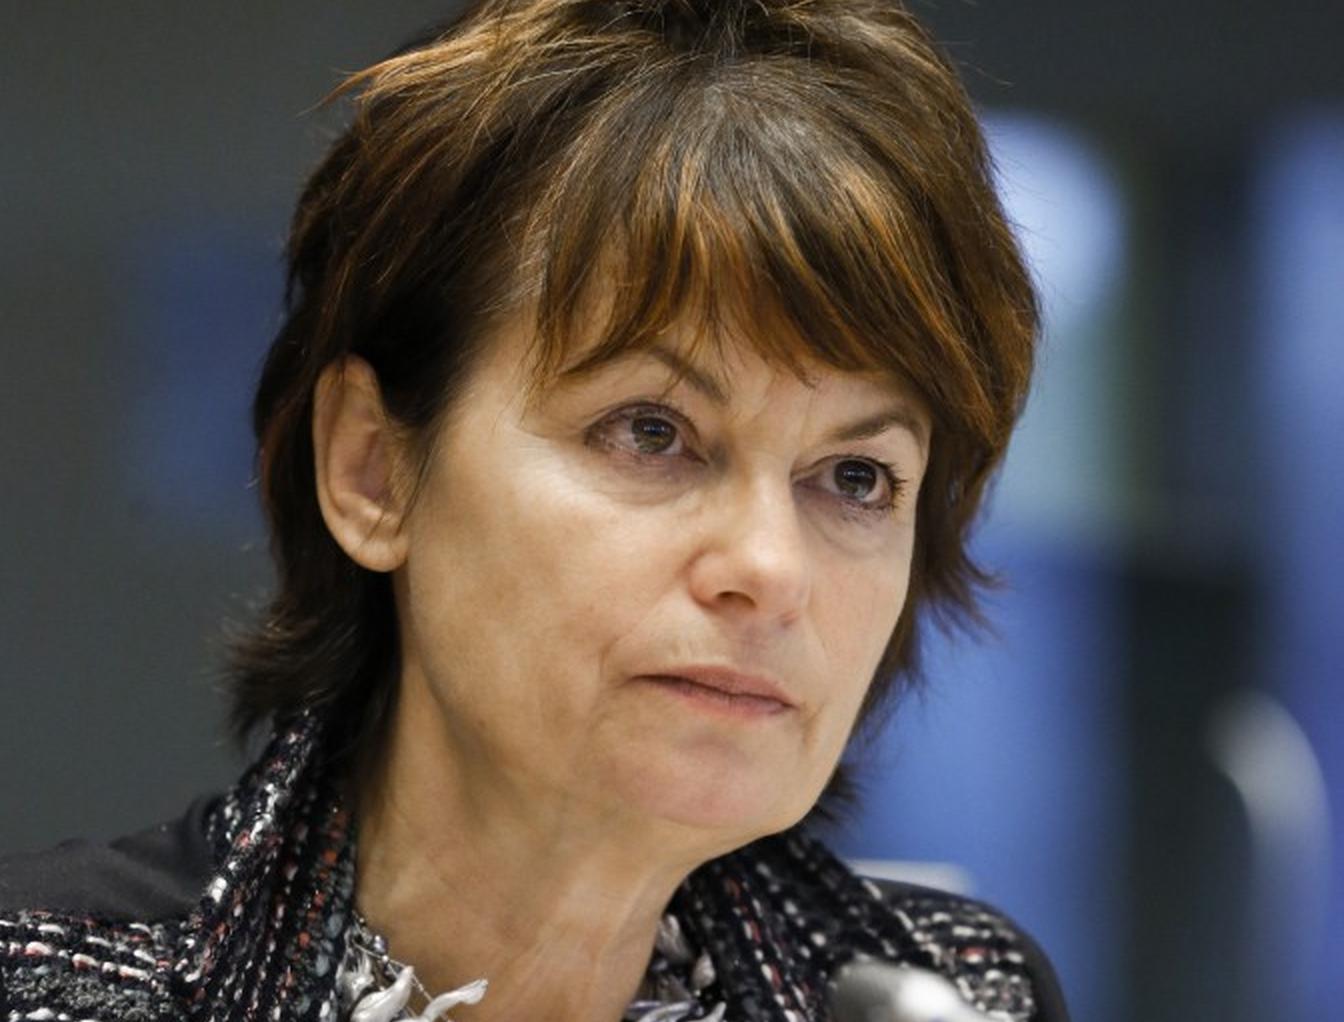 EU Chief: Our Work Should Not be Transparent